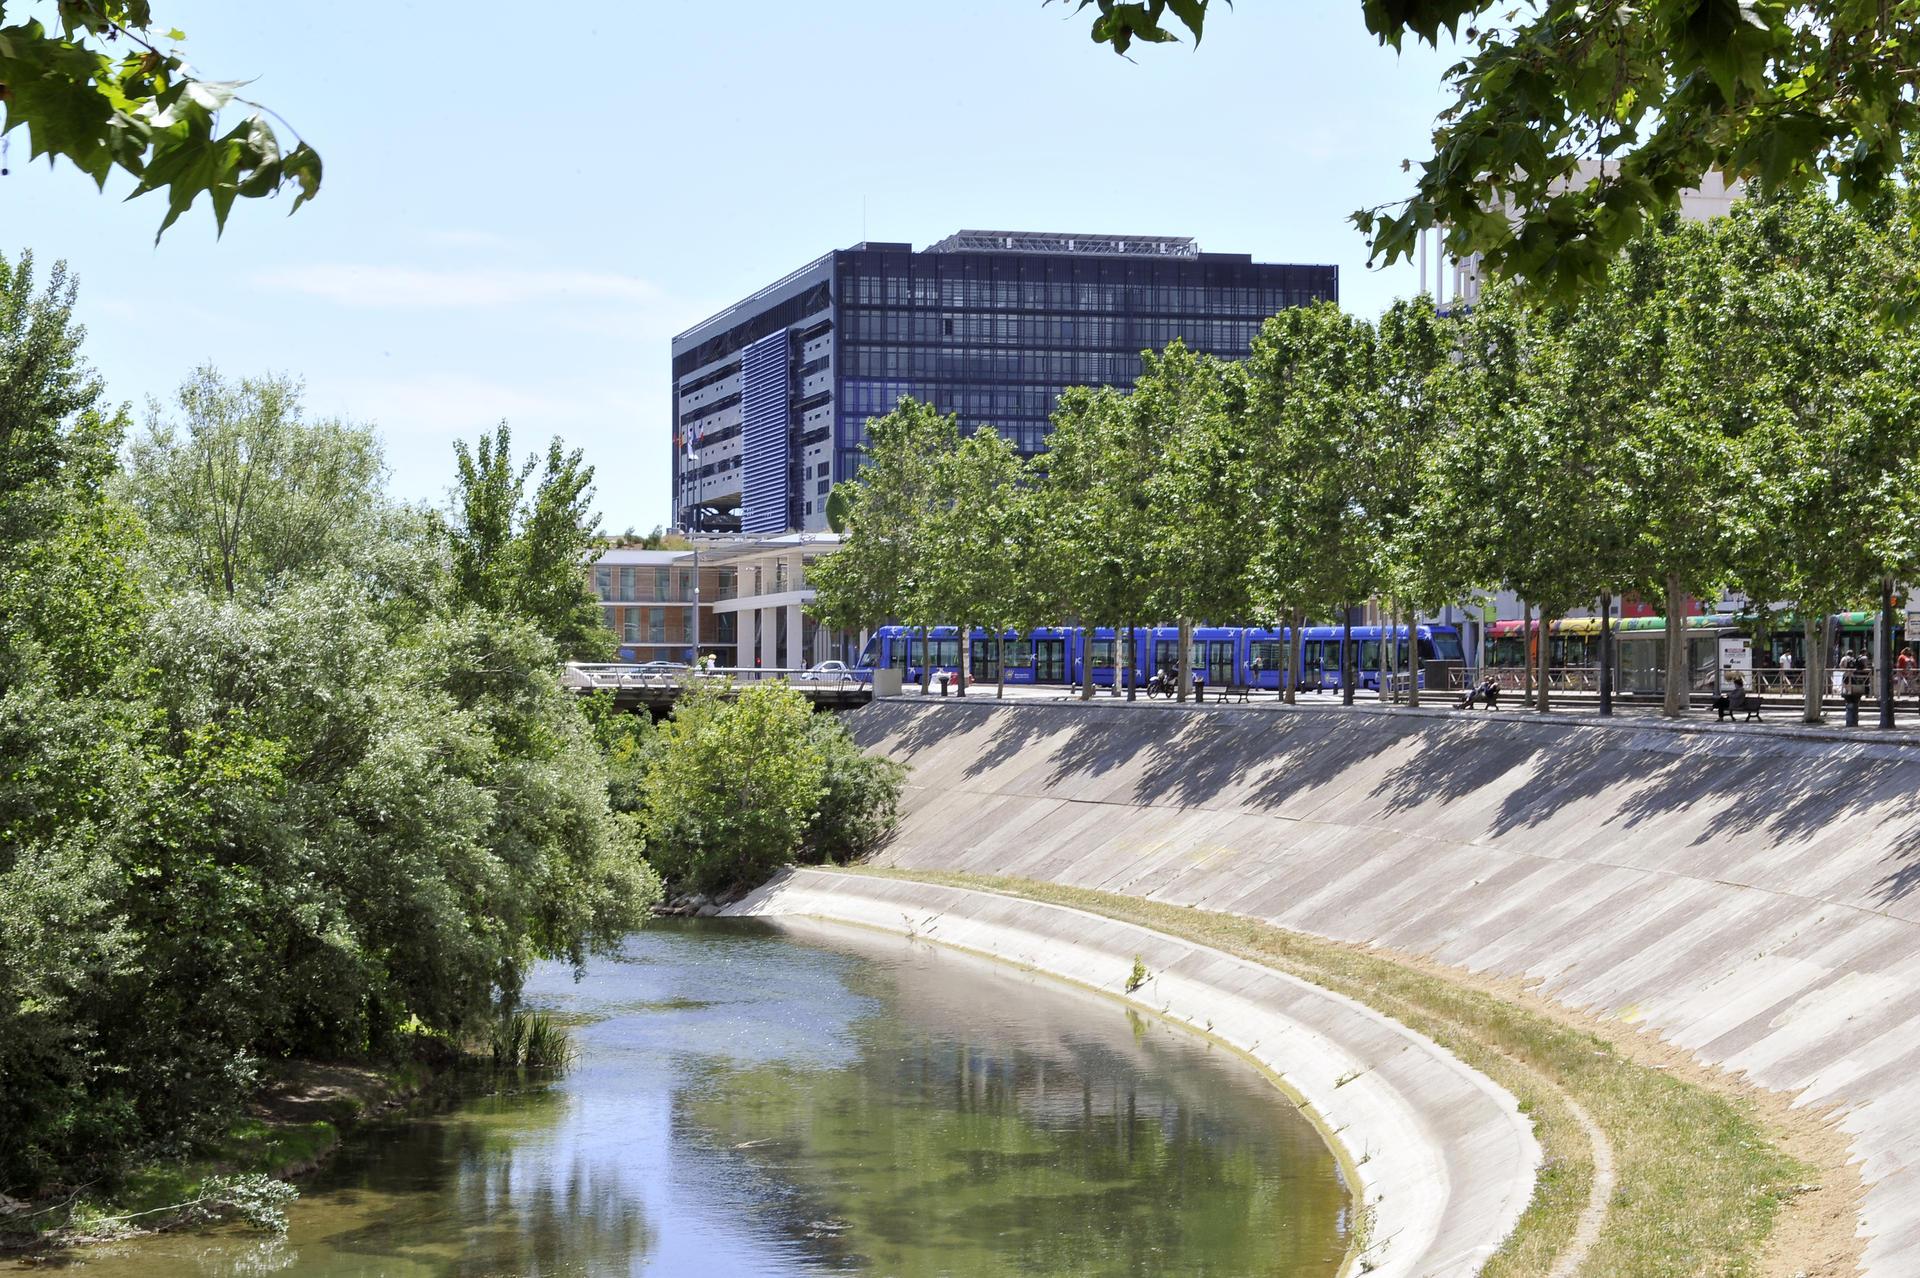 Montpellier en images ville de montpellier - Salle de sport port marianne montpellier ...